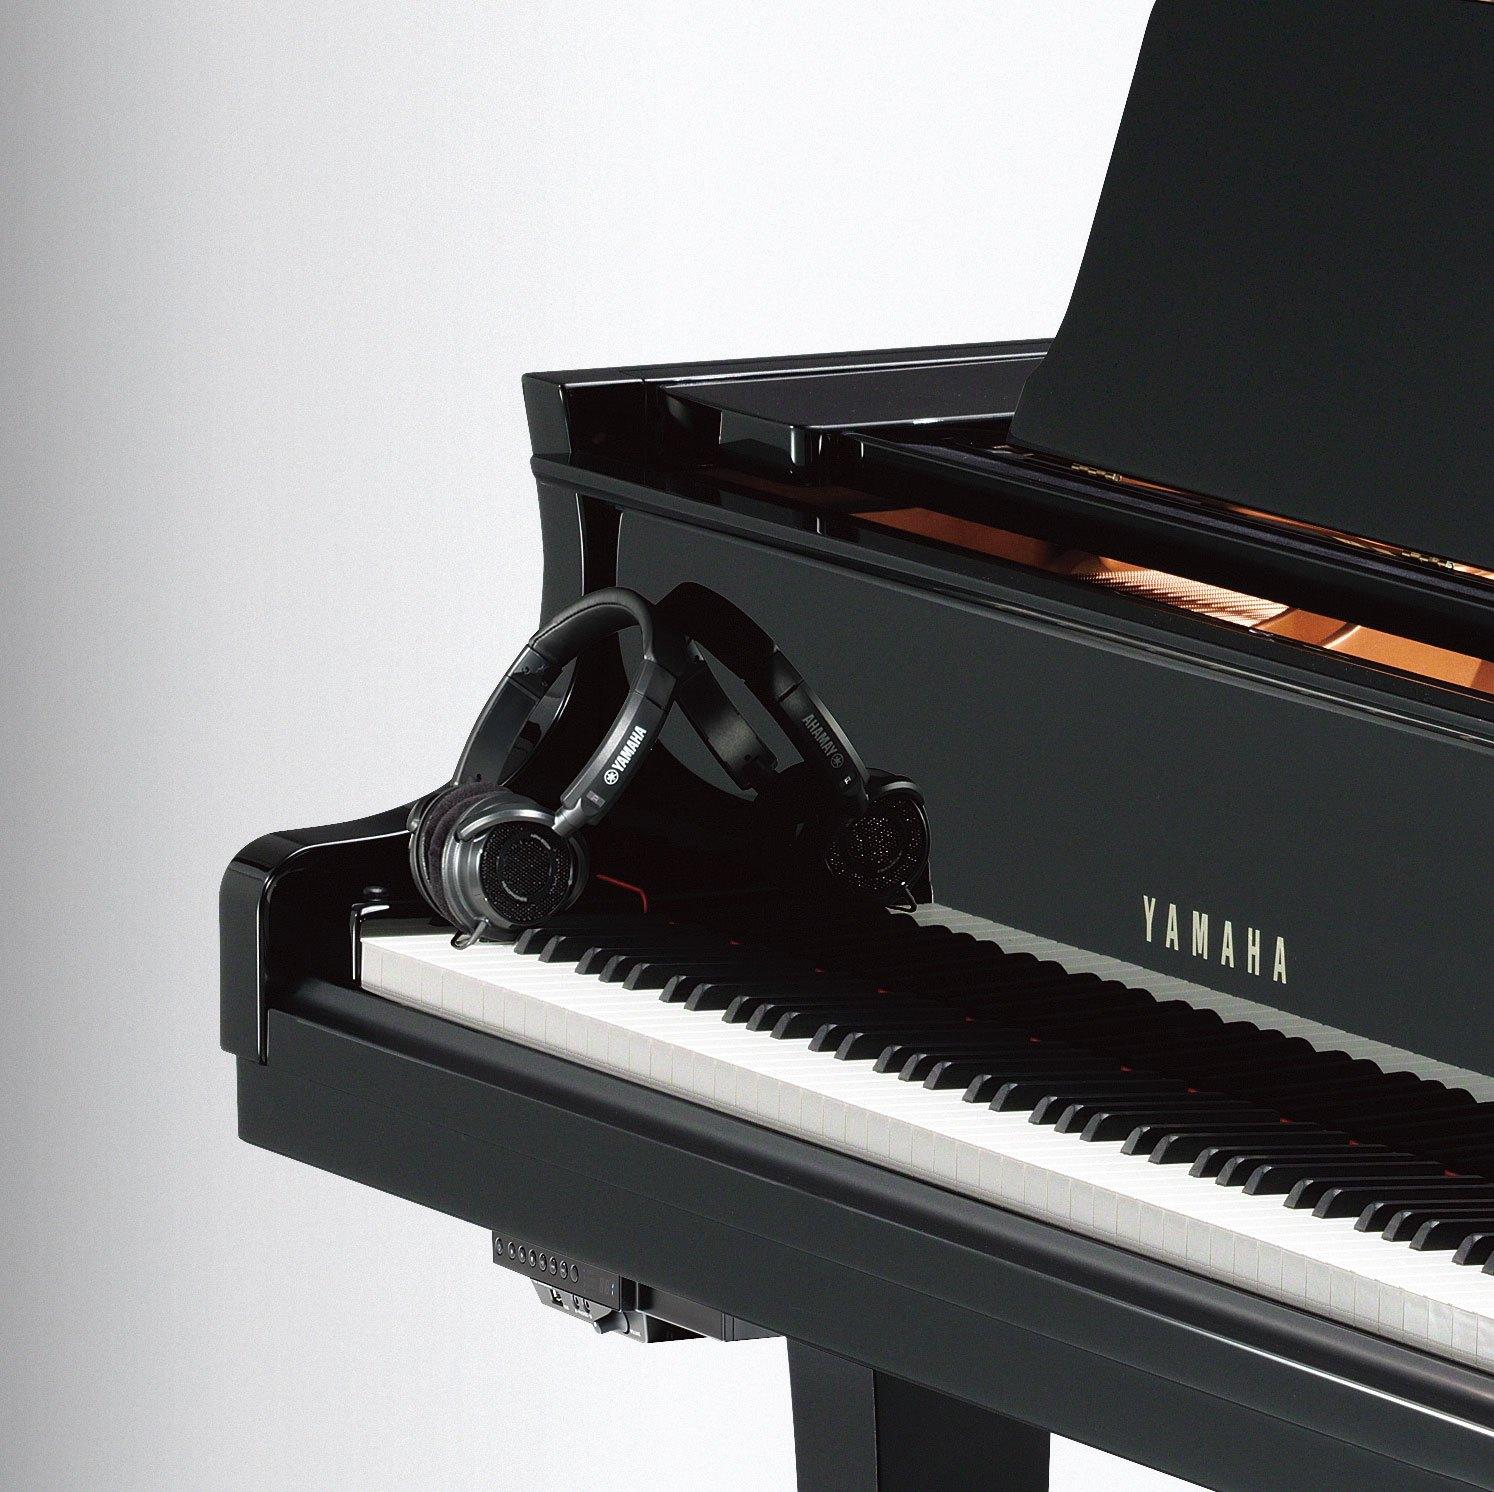 silent_piano_sh_a_0001_f_1494x1492_85afd